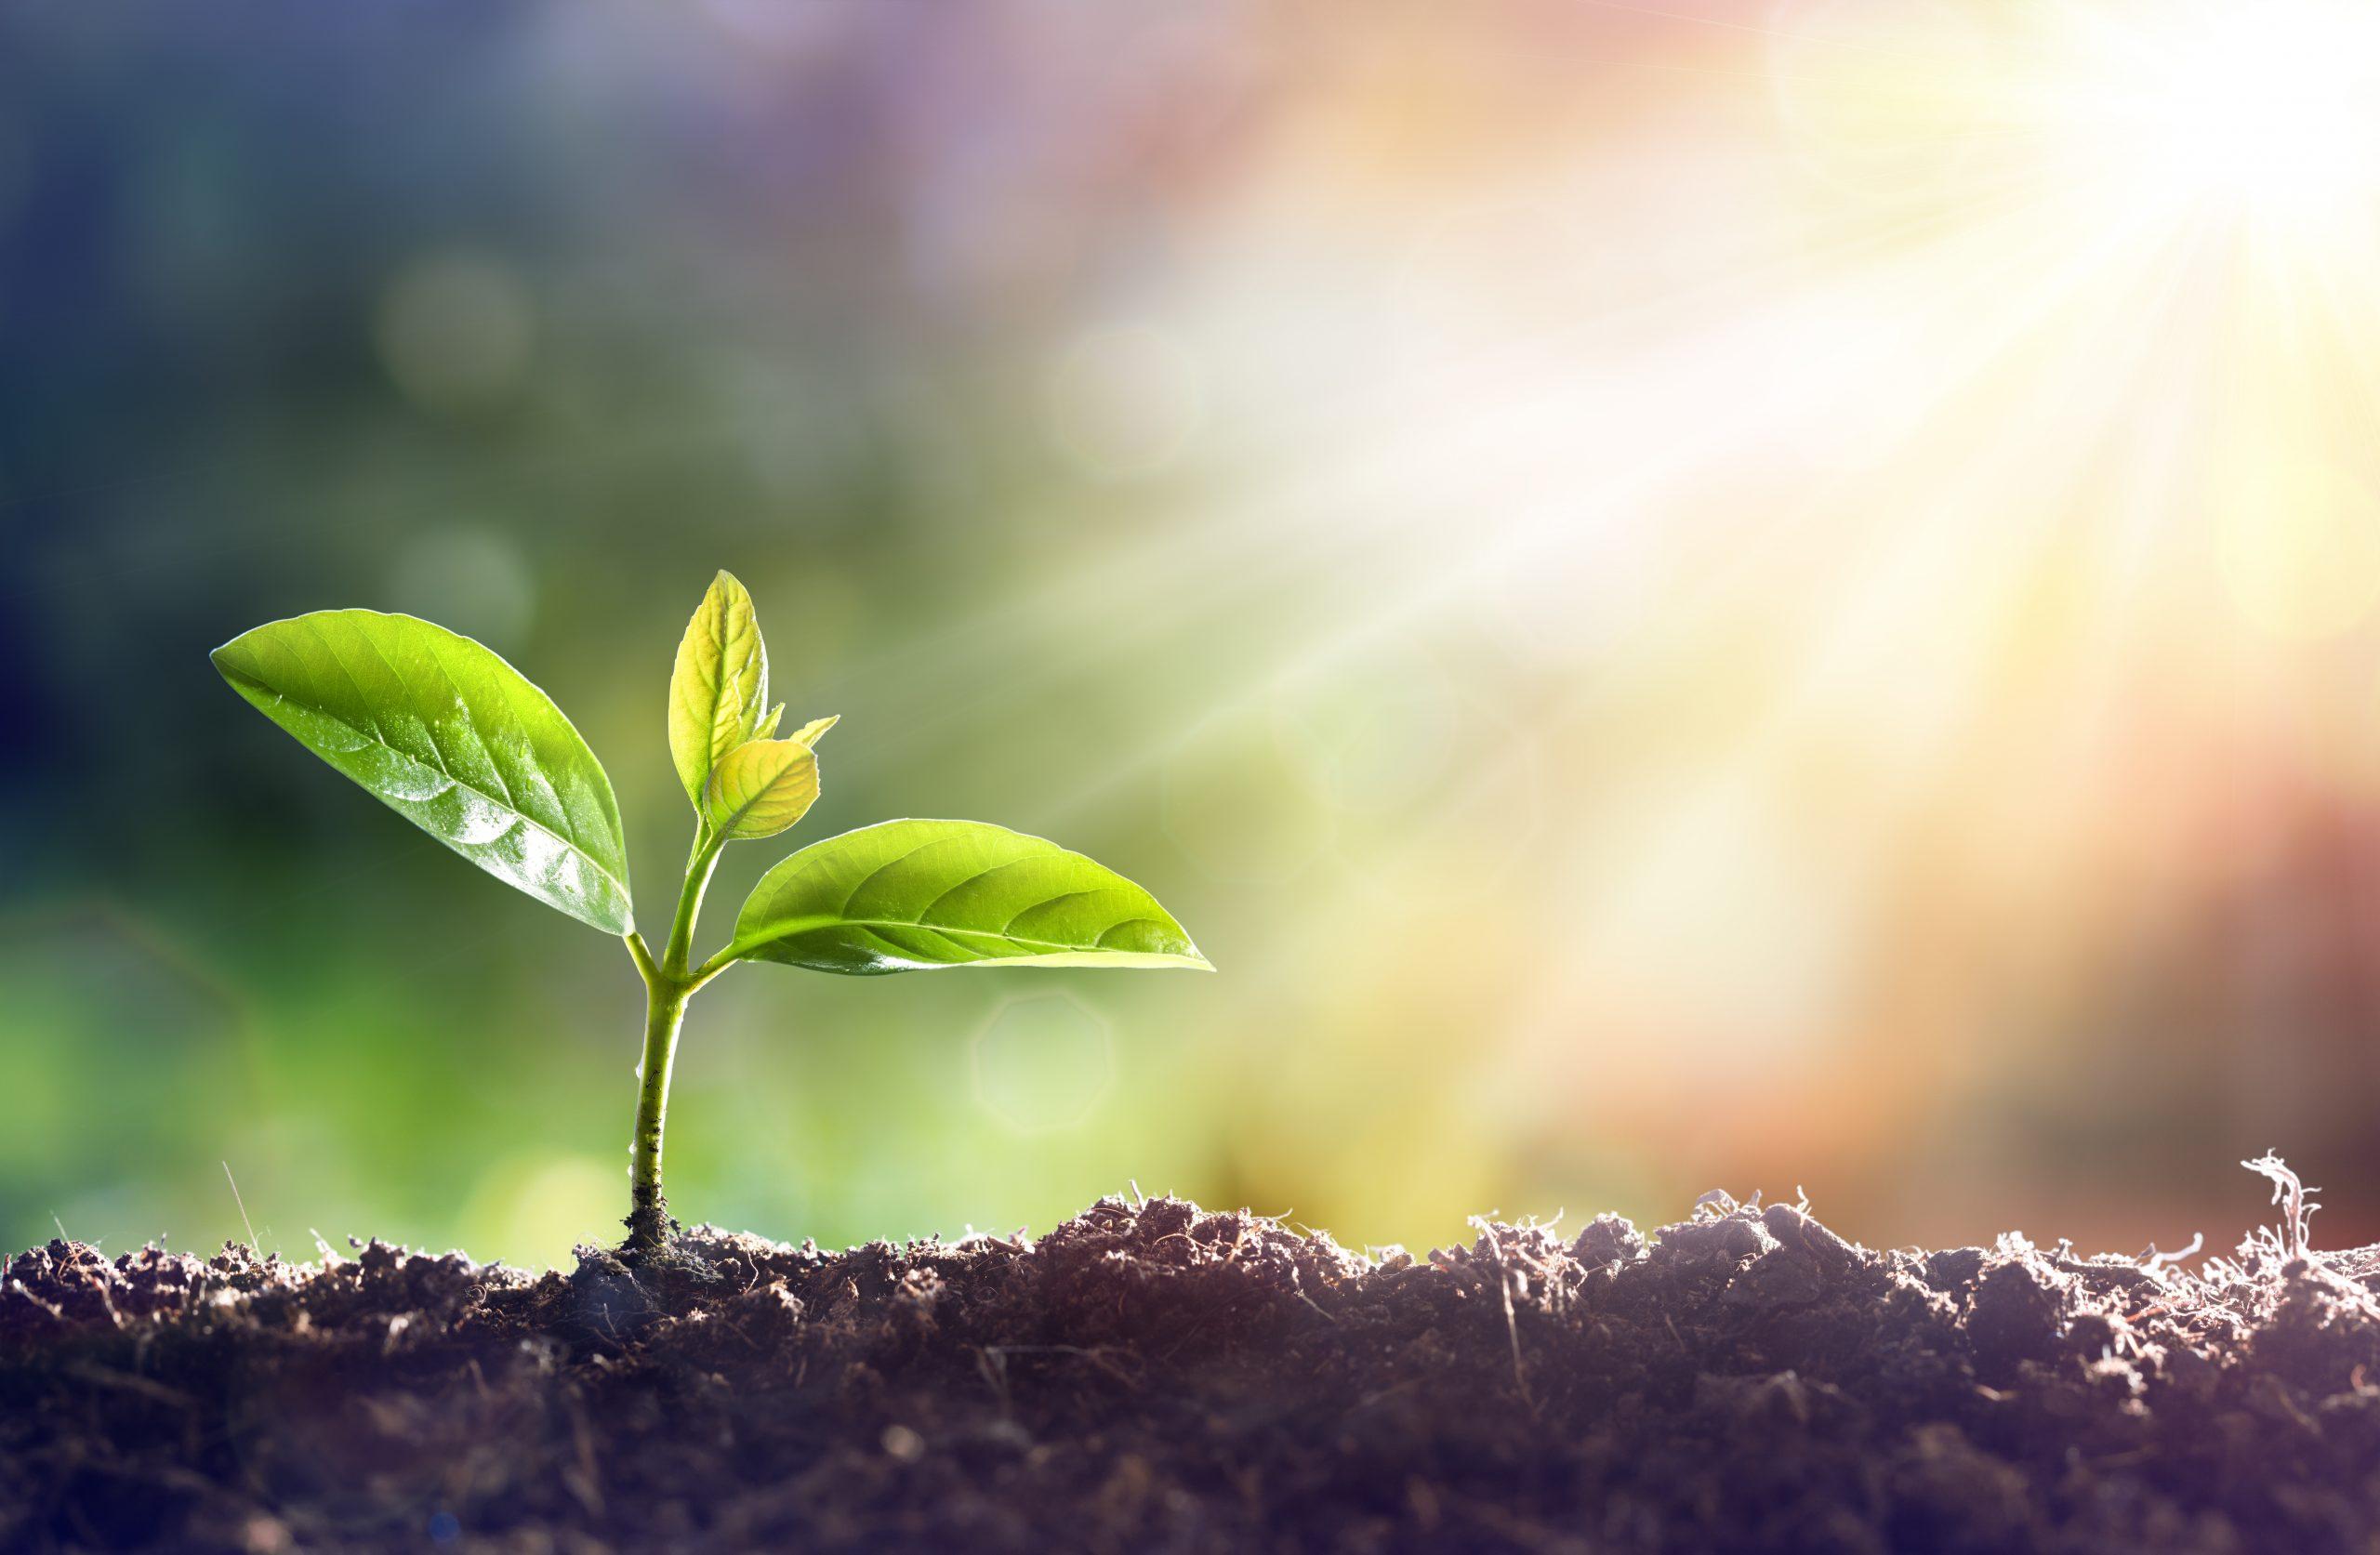 plantje dat ontspruit in zonlicht